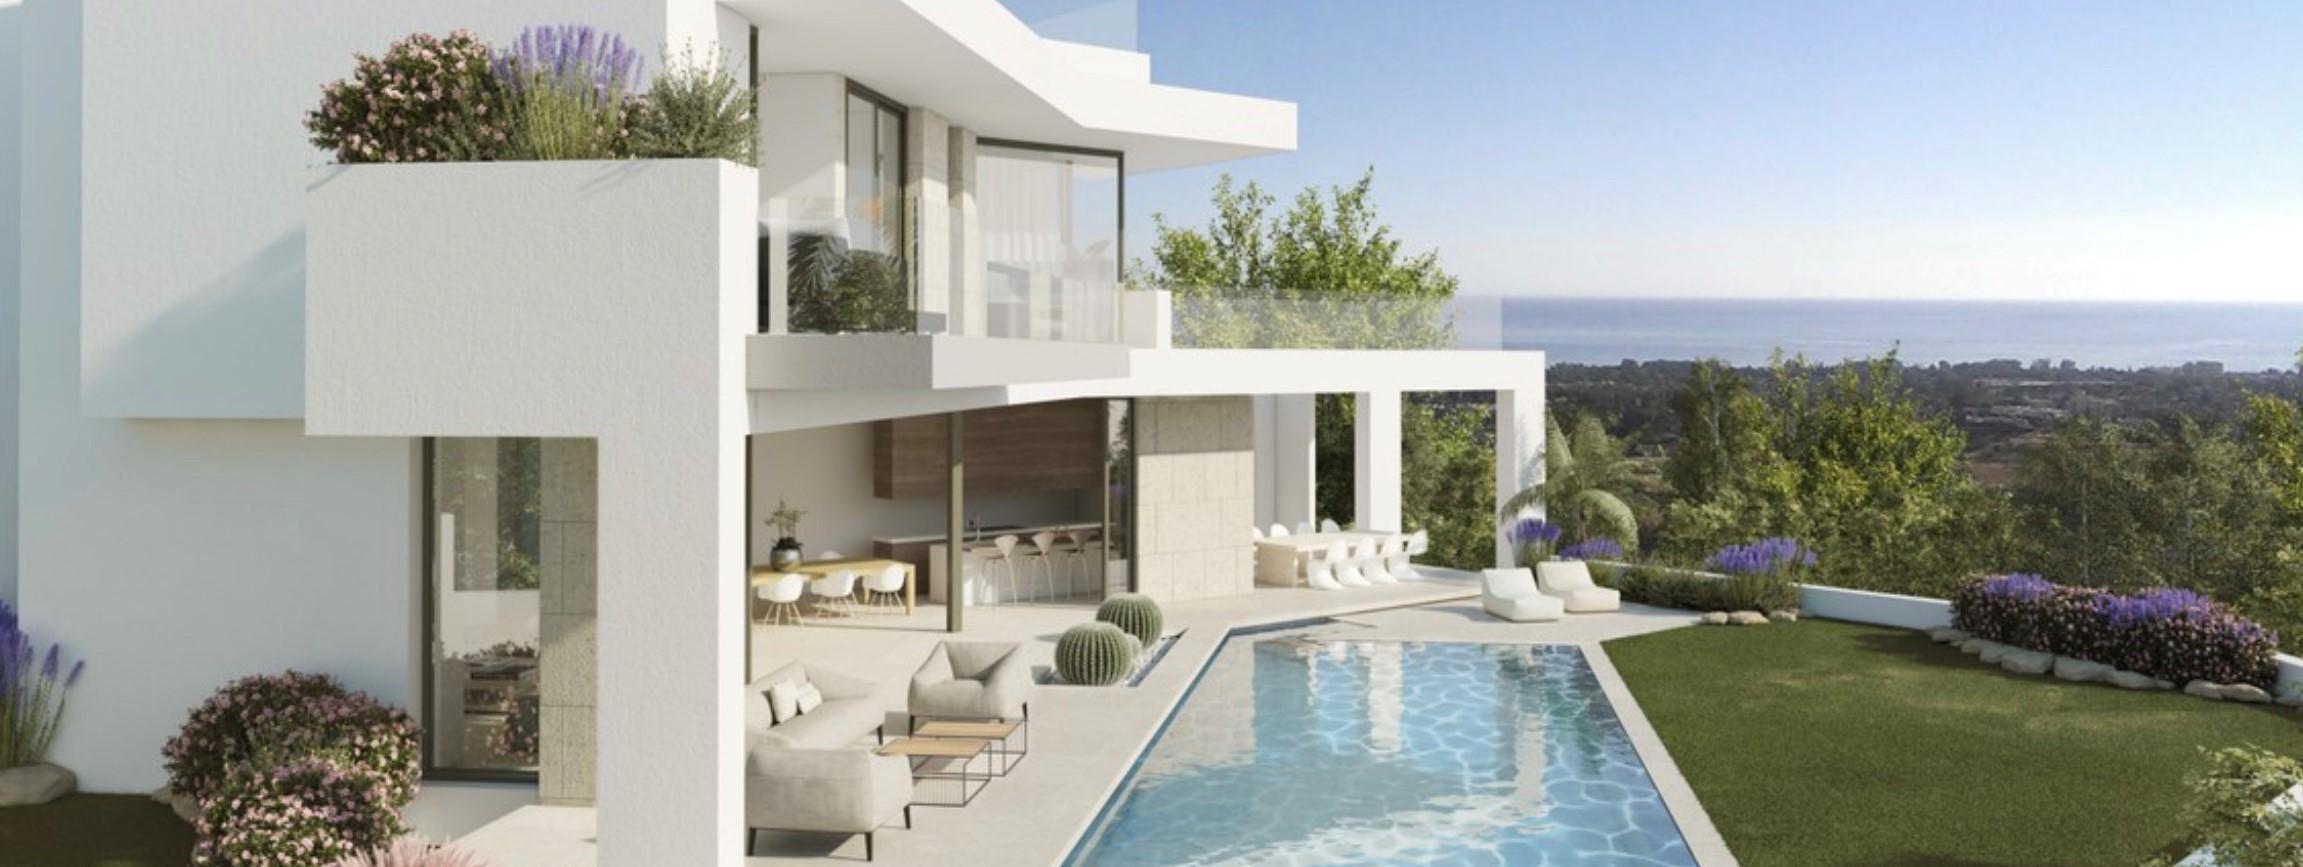 Marbesa villa €3.300.000